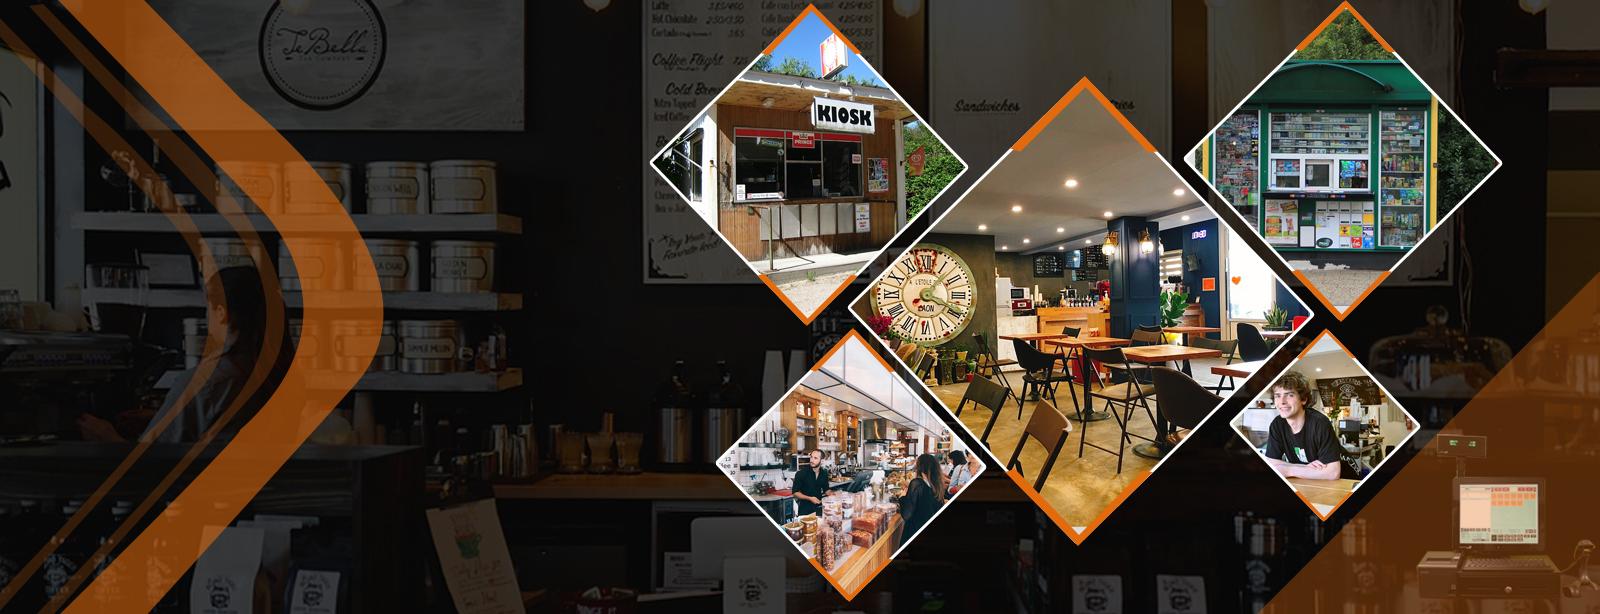 Café/Kiosks POS System